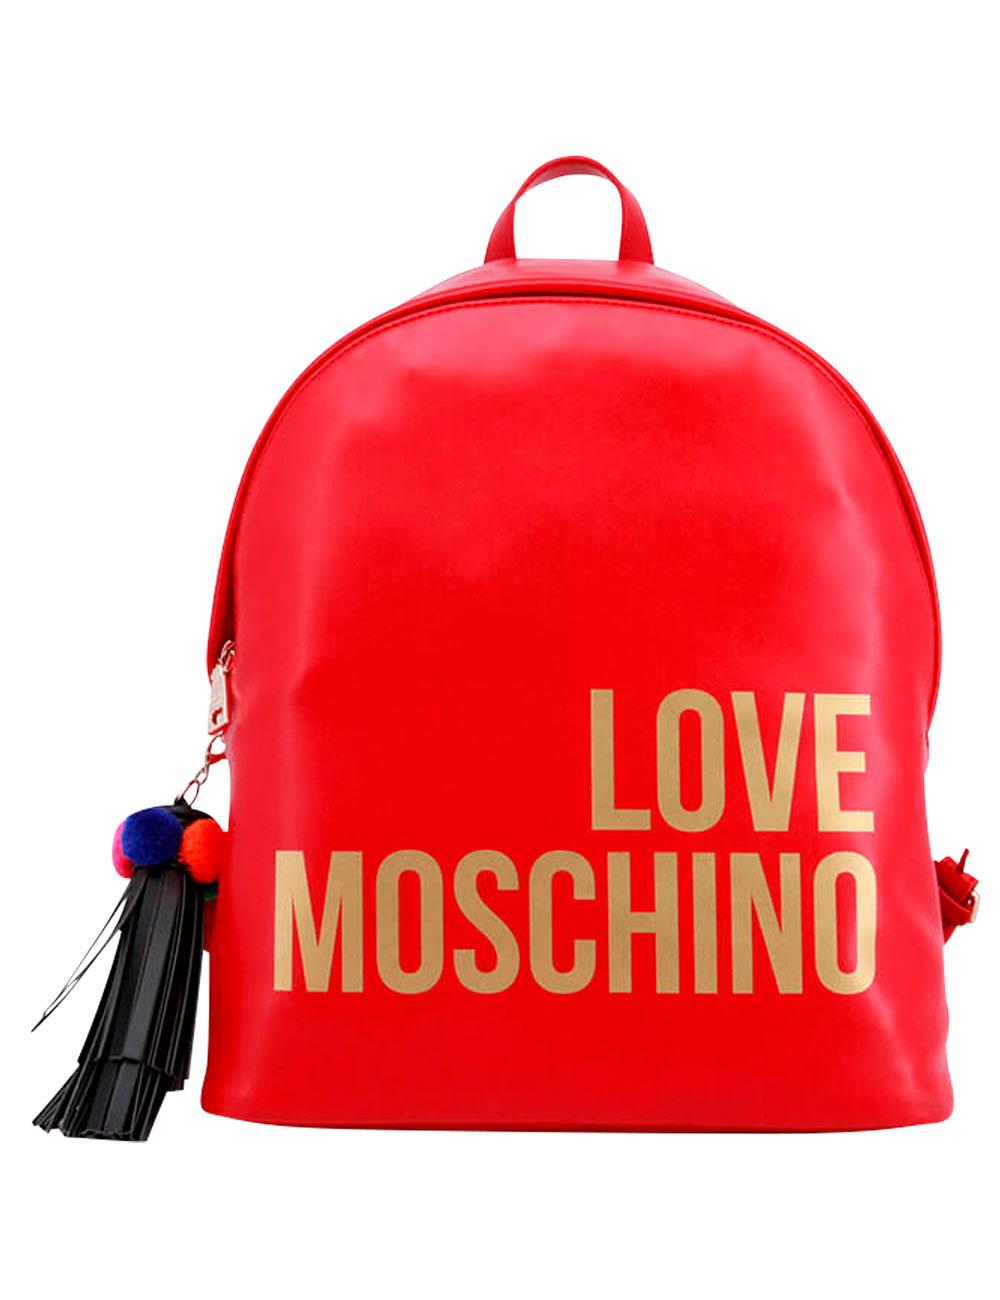 60c8f9bafdd32 Sac à dos, Love Moschino, rouge